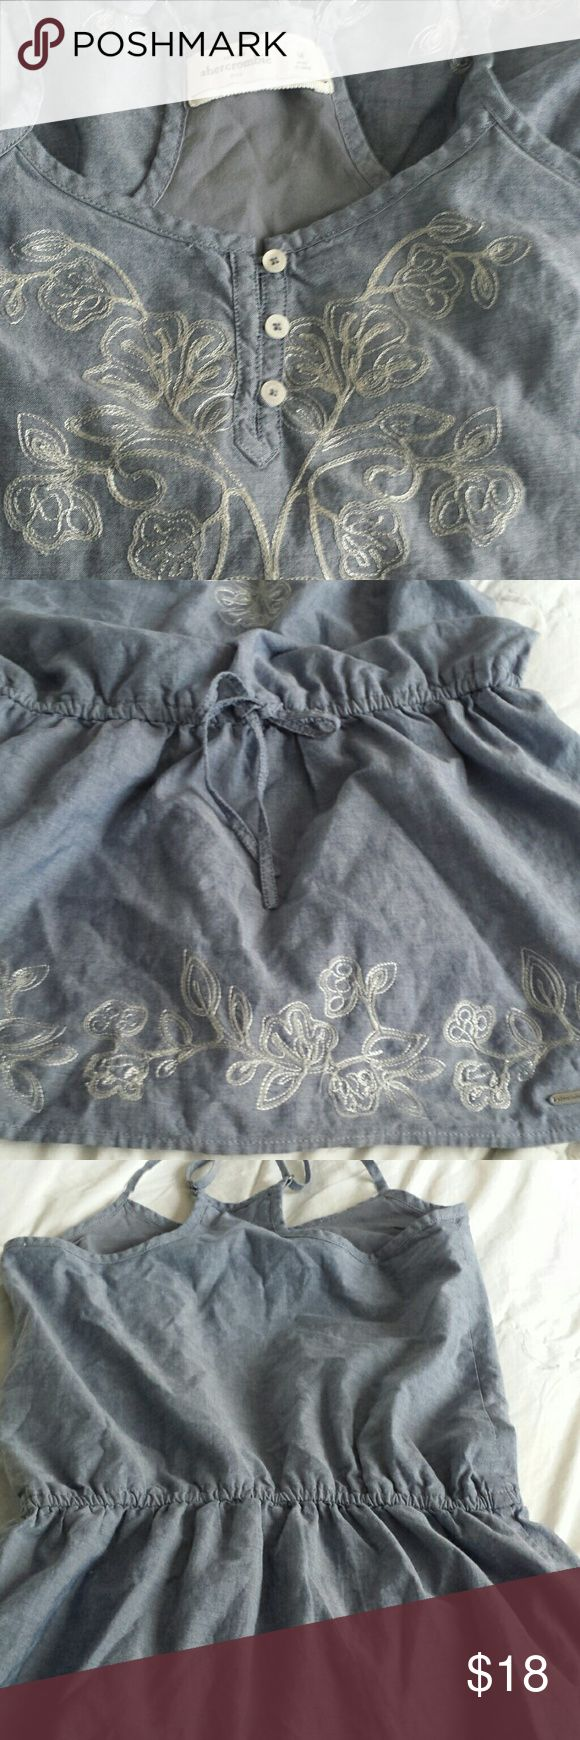 DENIM ABERCROMBIE GIRLS DRESS. ABERCROMBIE DRESS WITH ADJUSTABLE SHOULDER AND WAIST STRAPS. ABERCROMBIE  Dresses